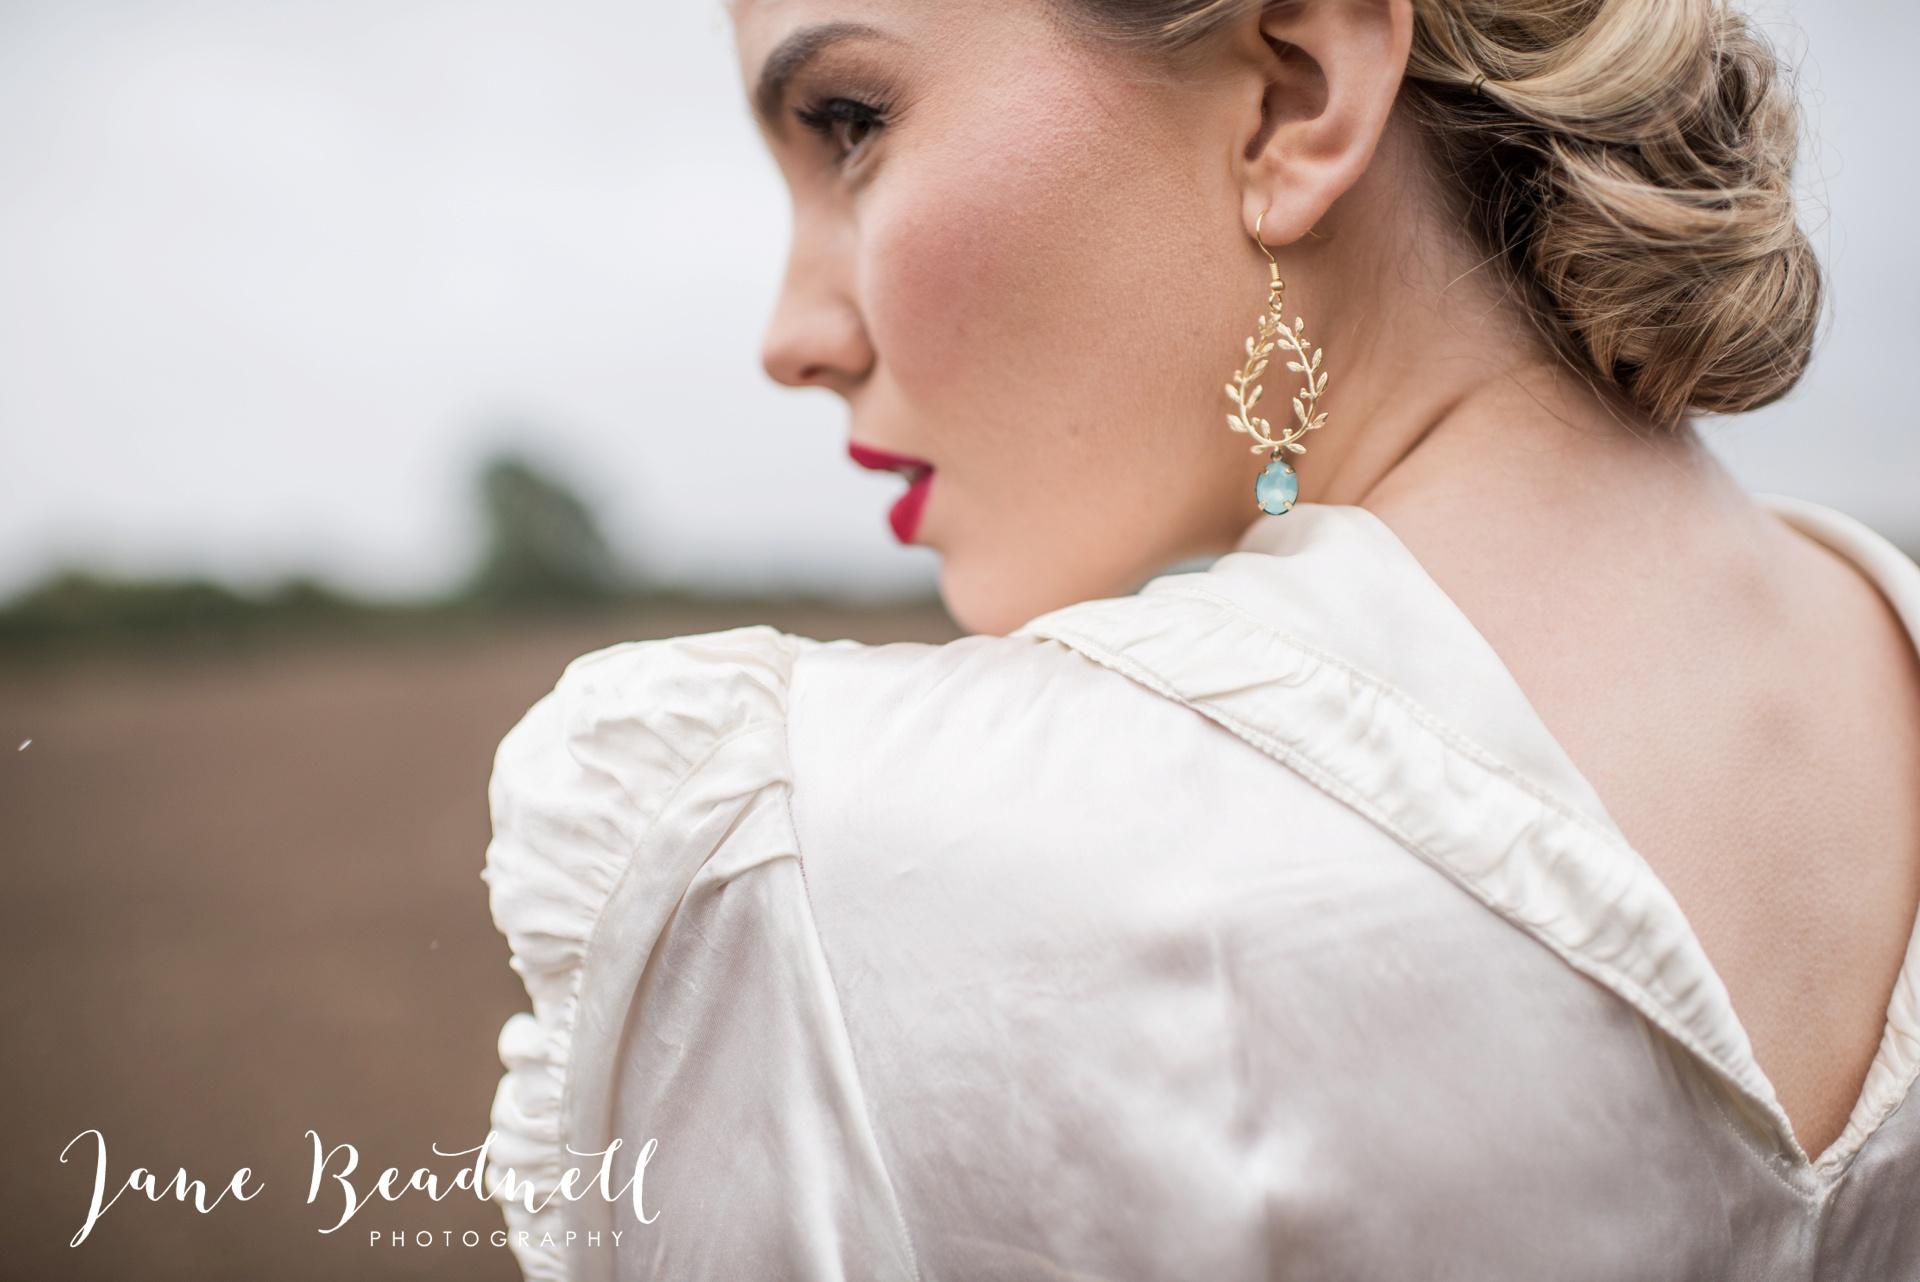 fine-art-wedding-photographer-jane-beadnell-photography_0018